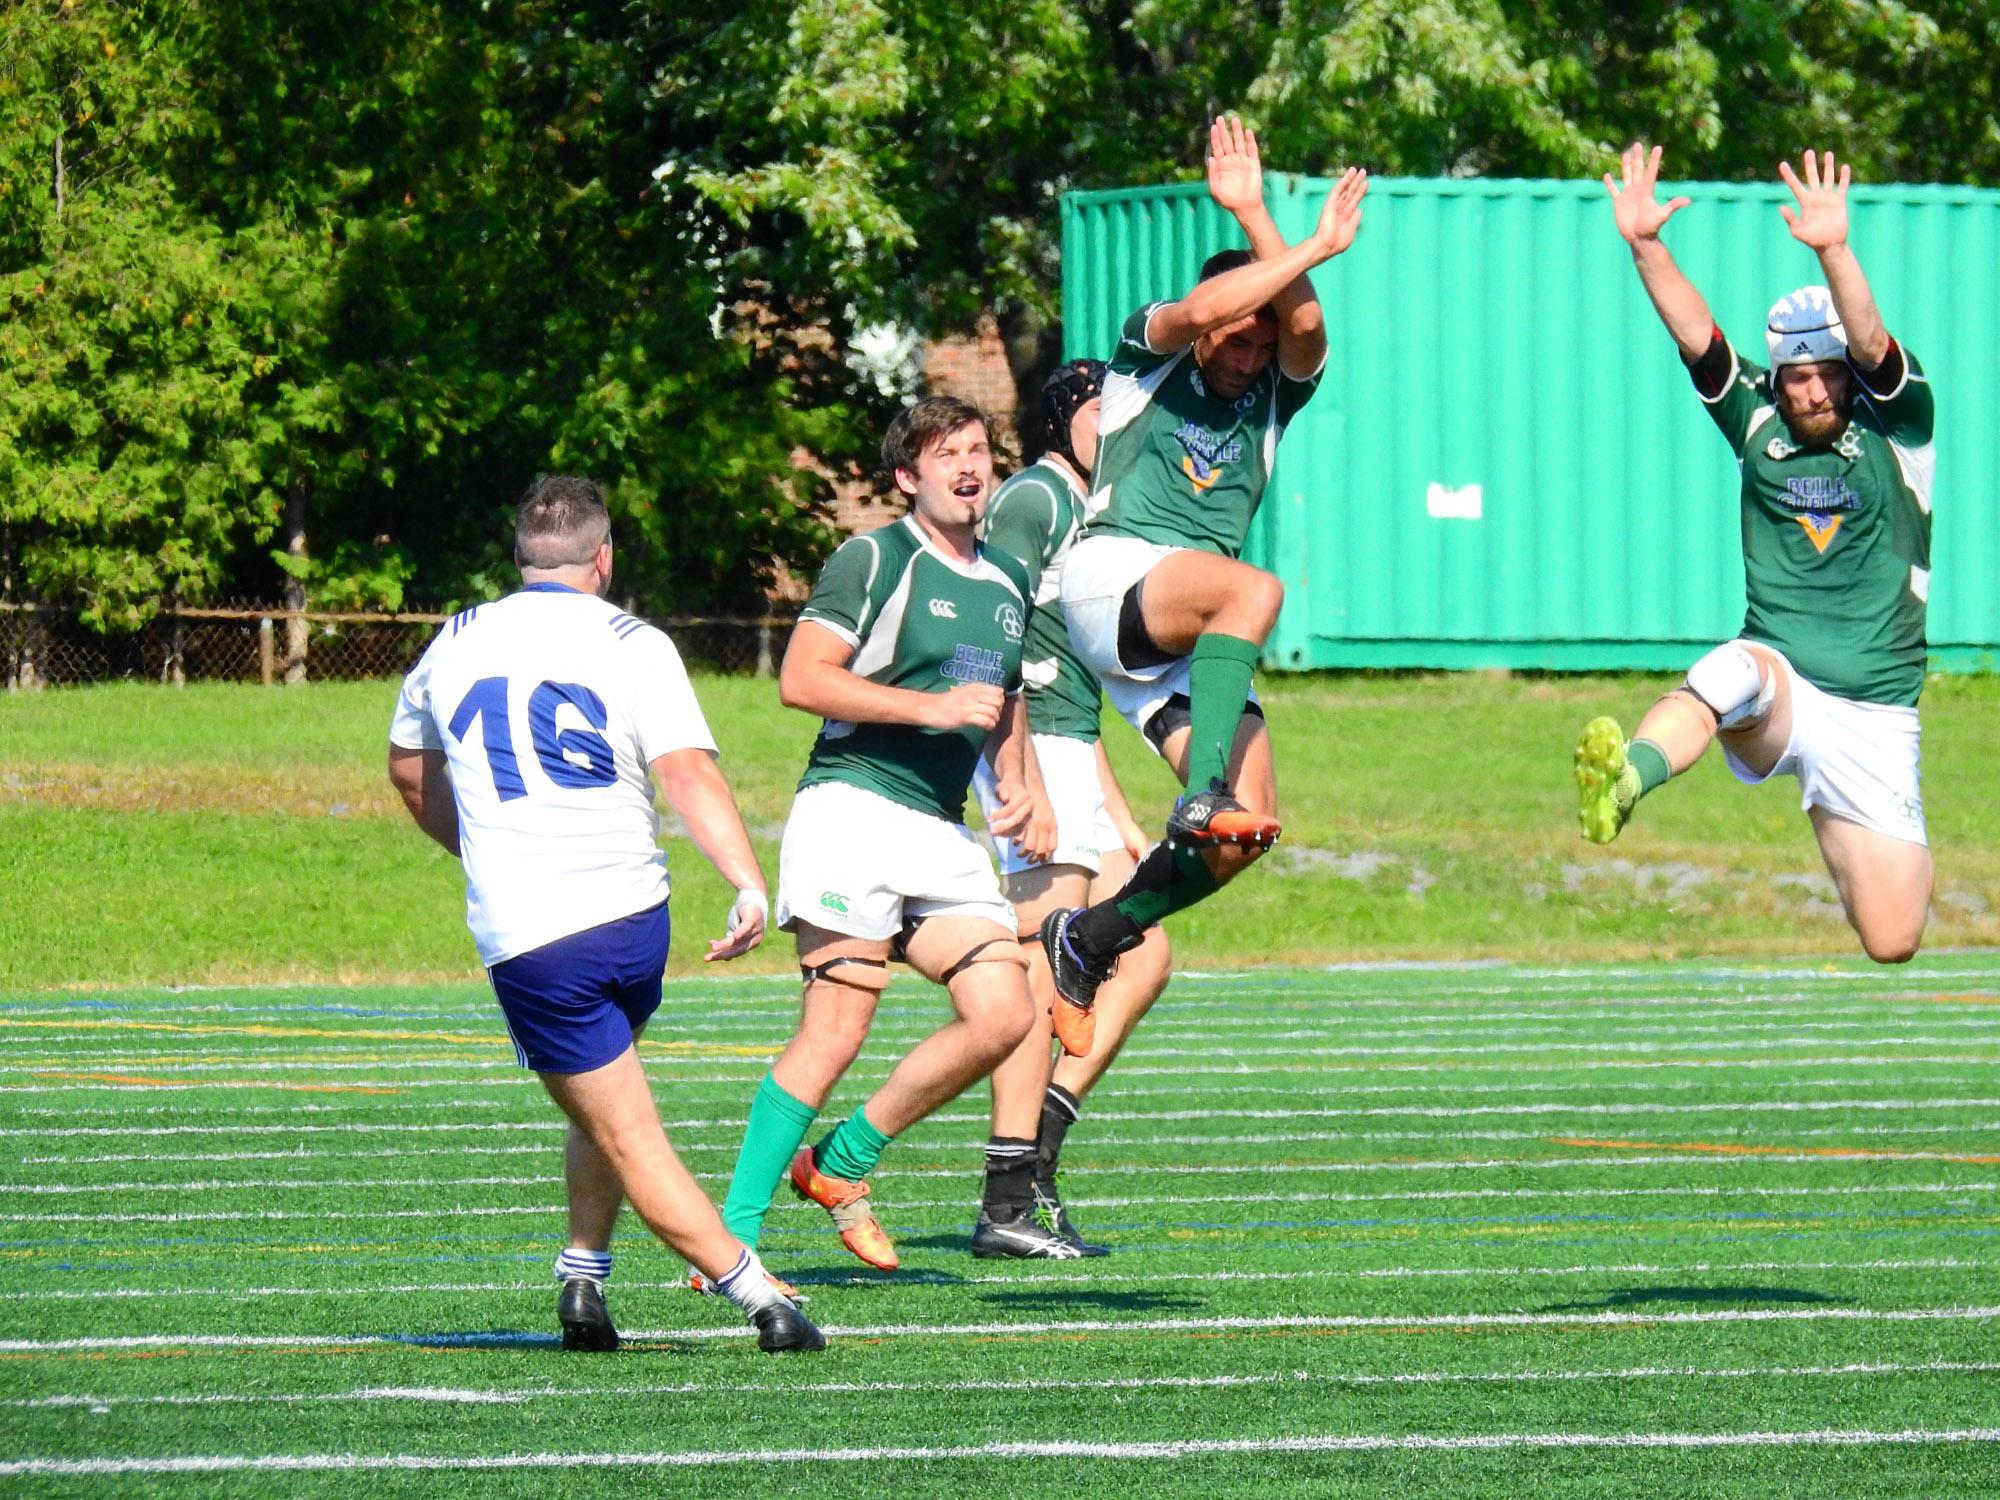 - Montreal Irish RFC - Rugby - 2018/Sep/15